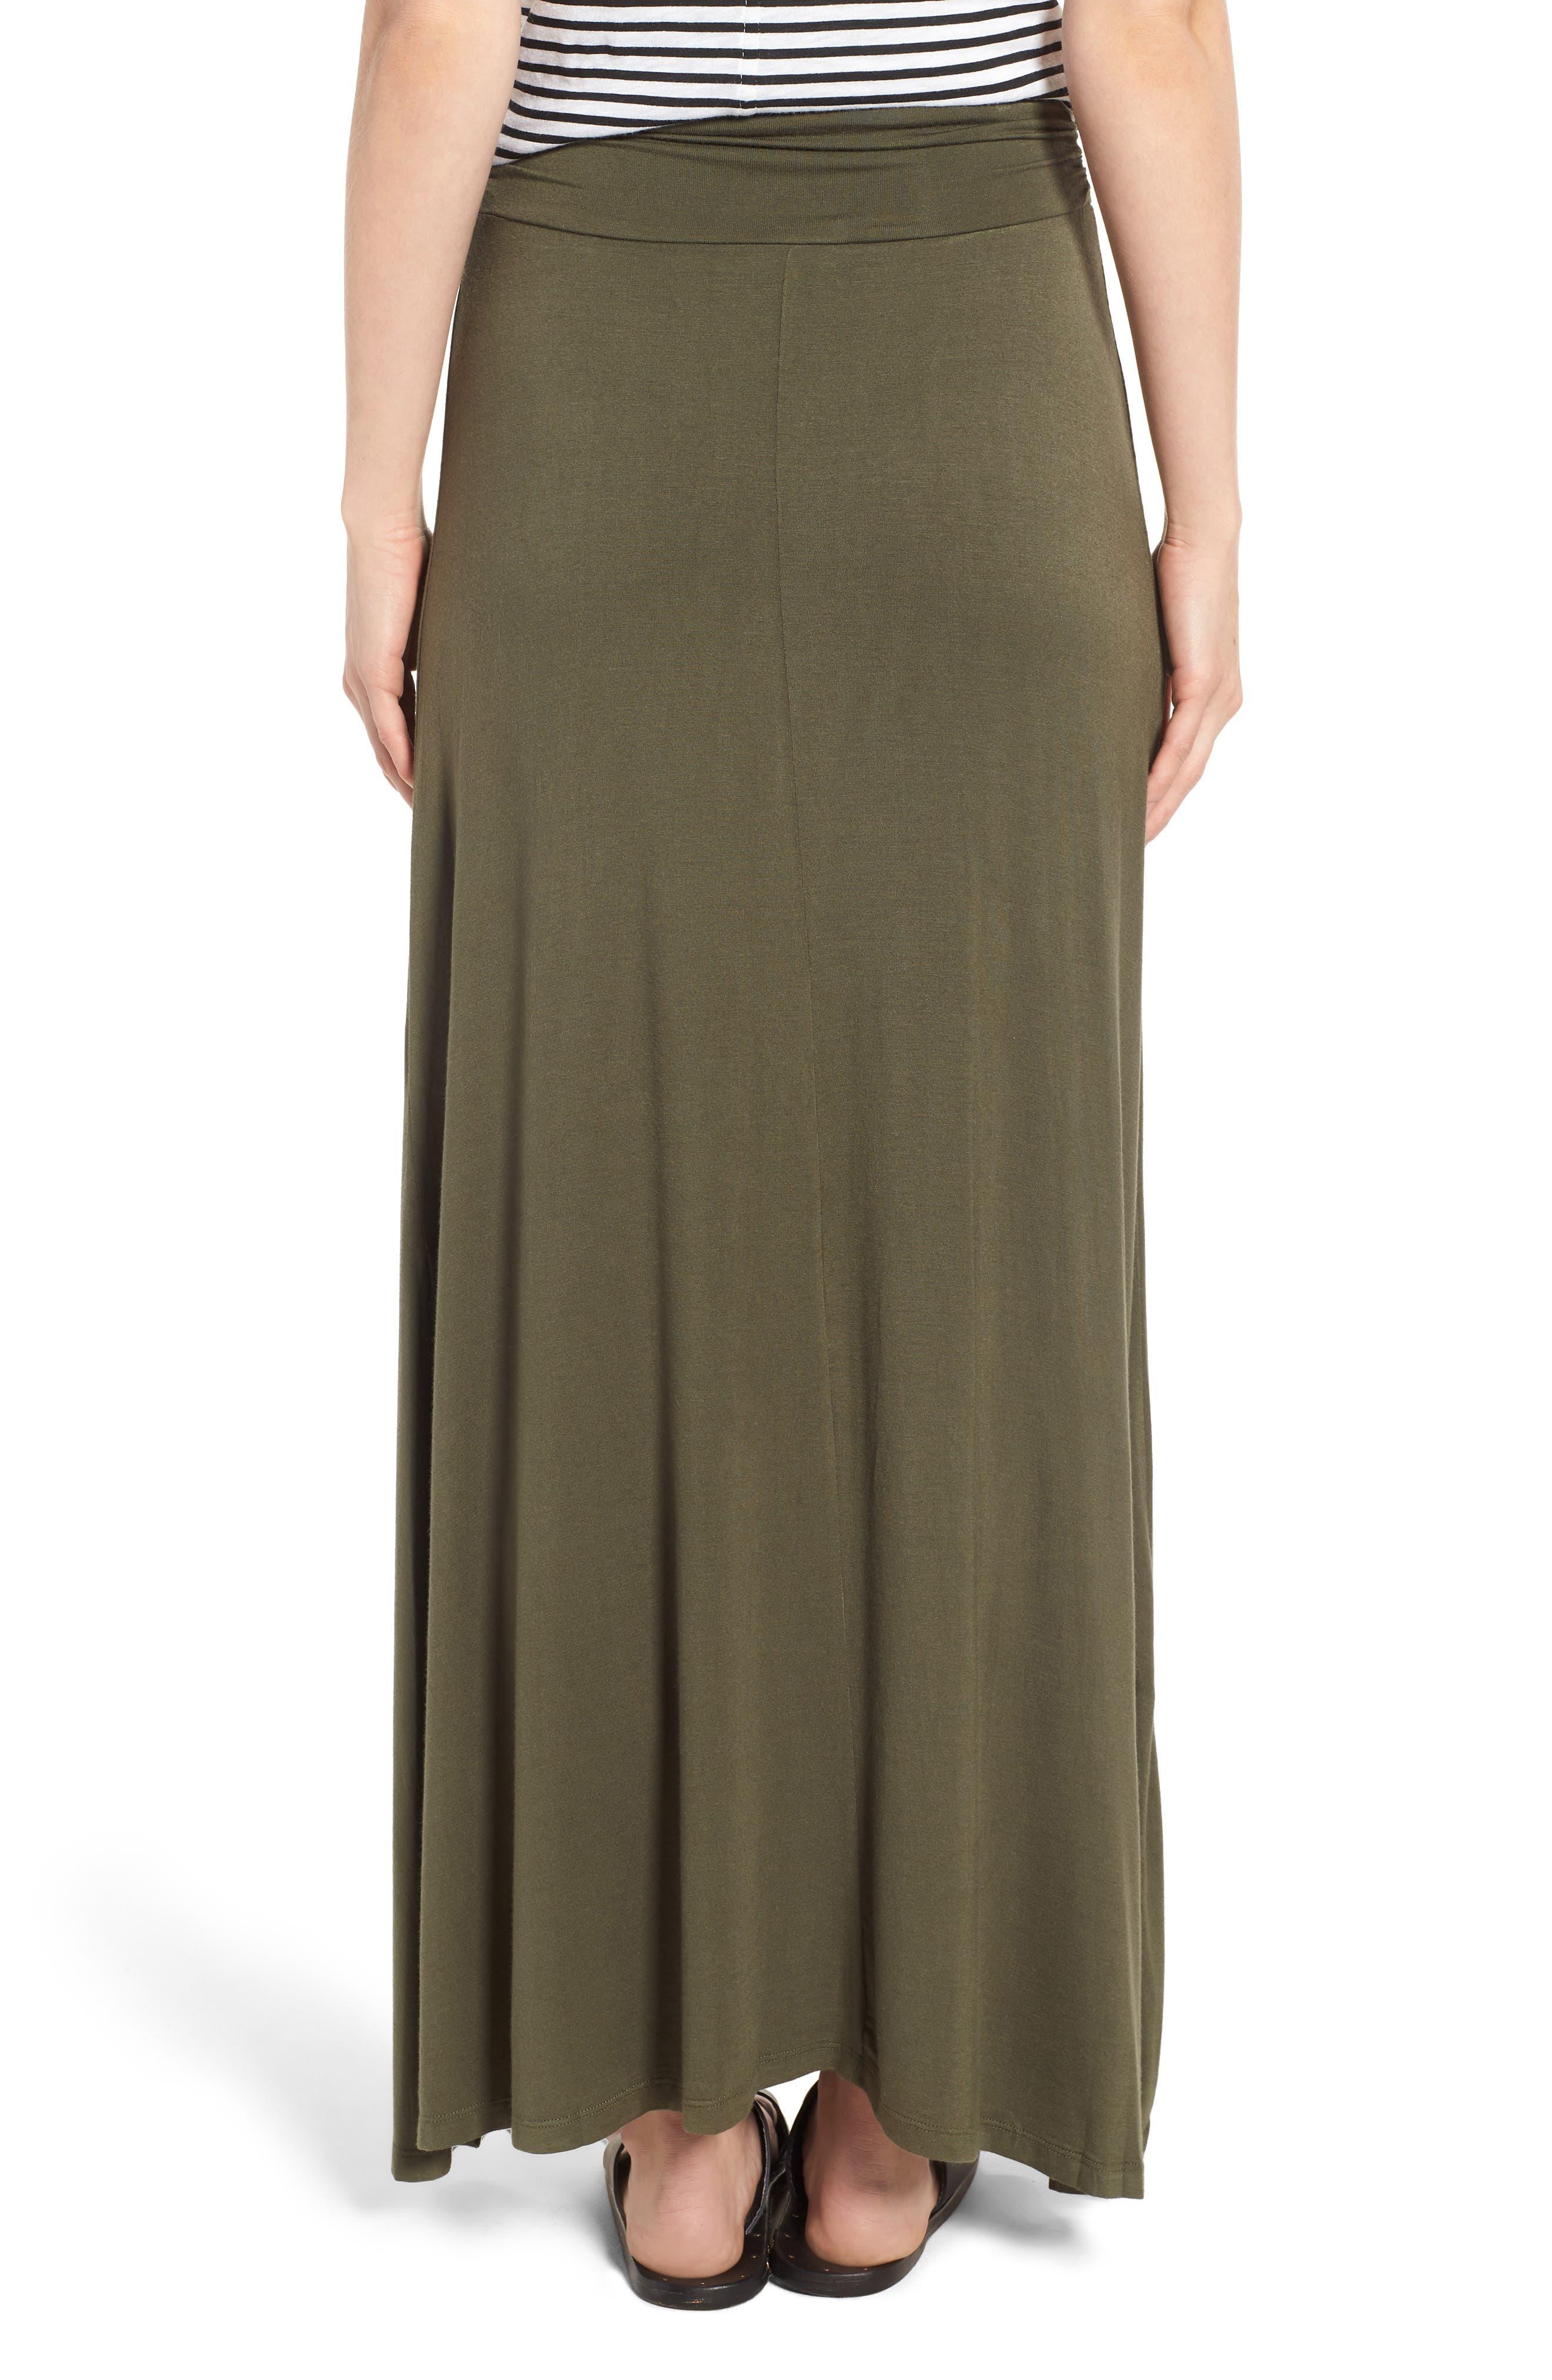 Ruched Waist Side Slit Maxi Skirt,                             Alternate thumbnail 2, color,                             302